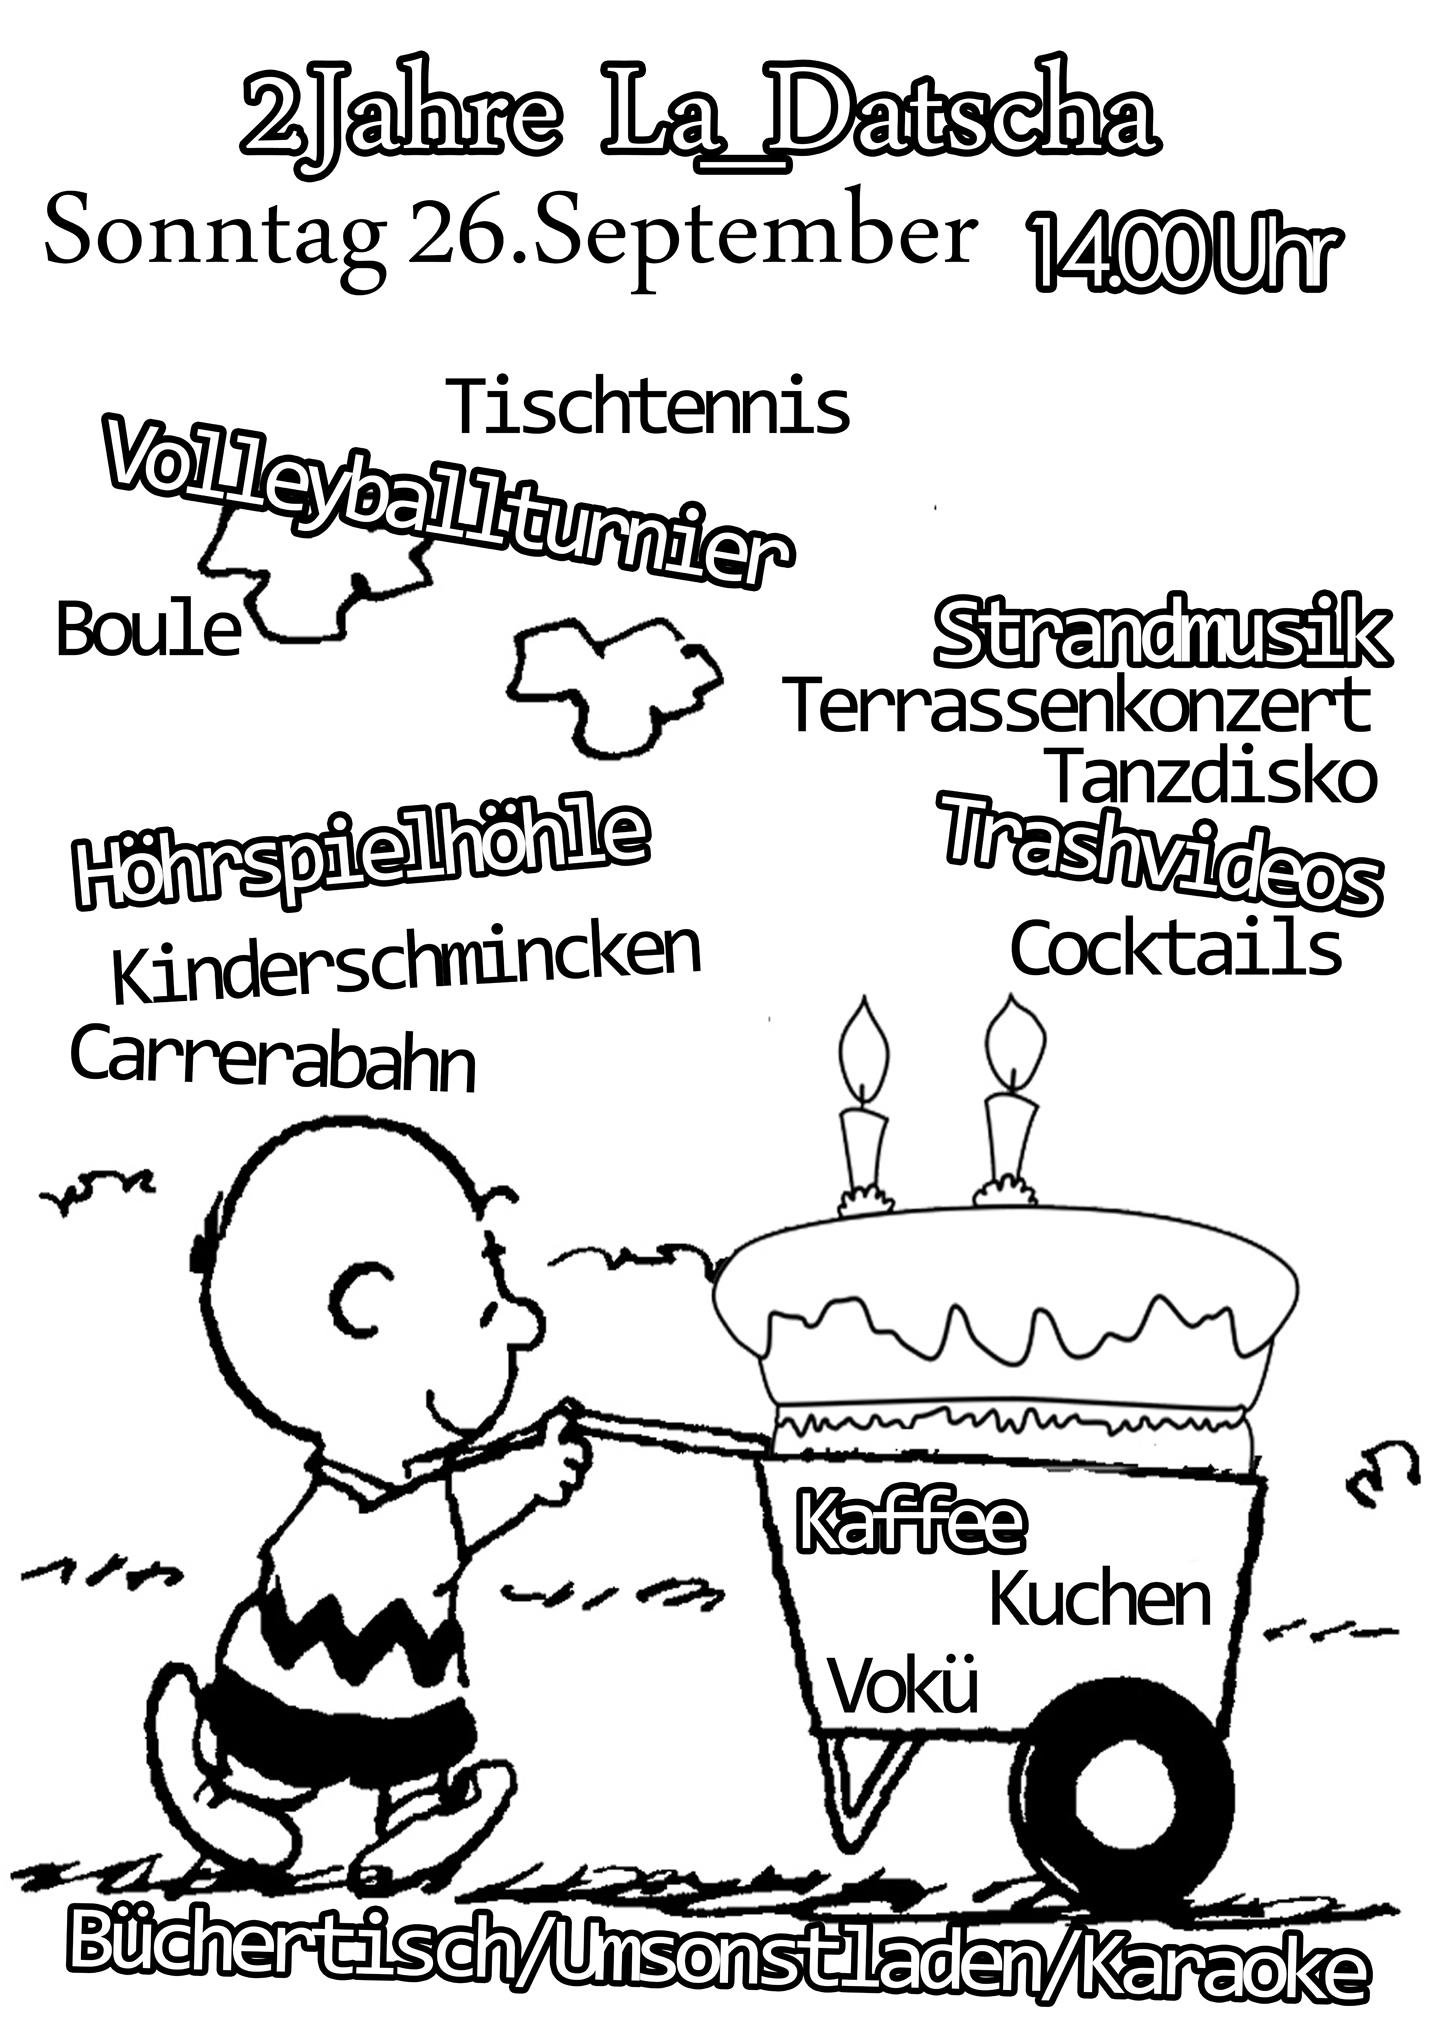 Archiv la datscha for Kuchen volker hosbach